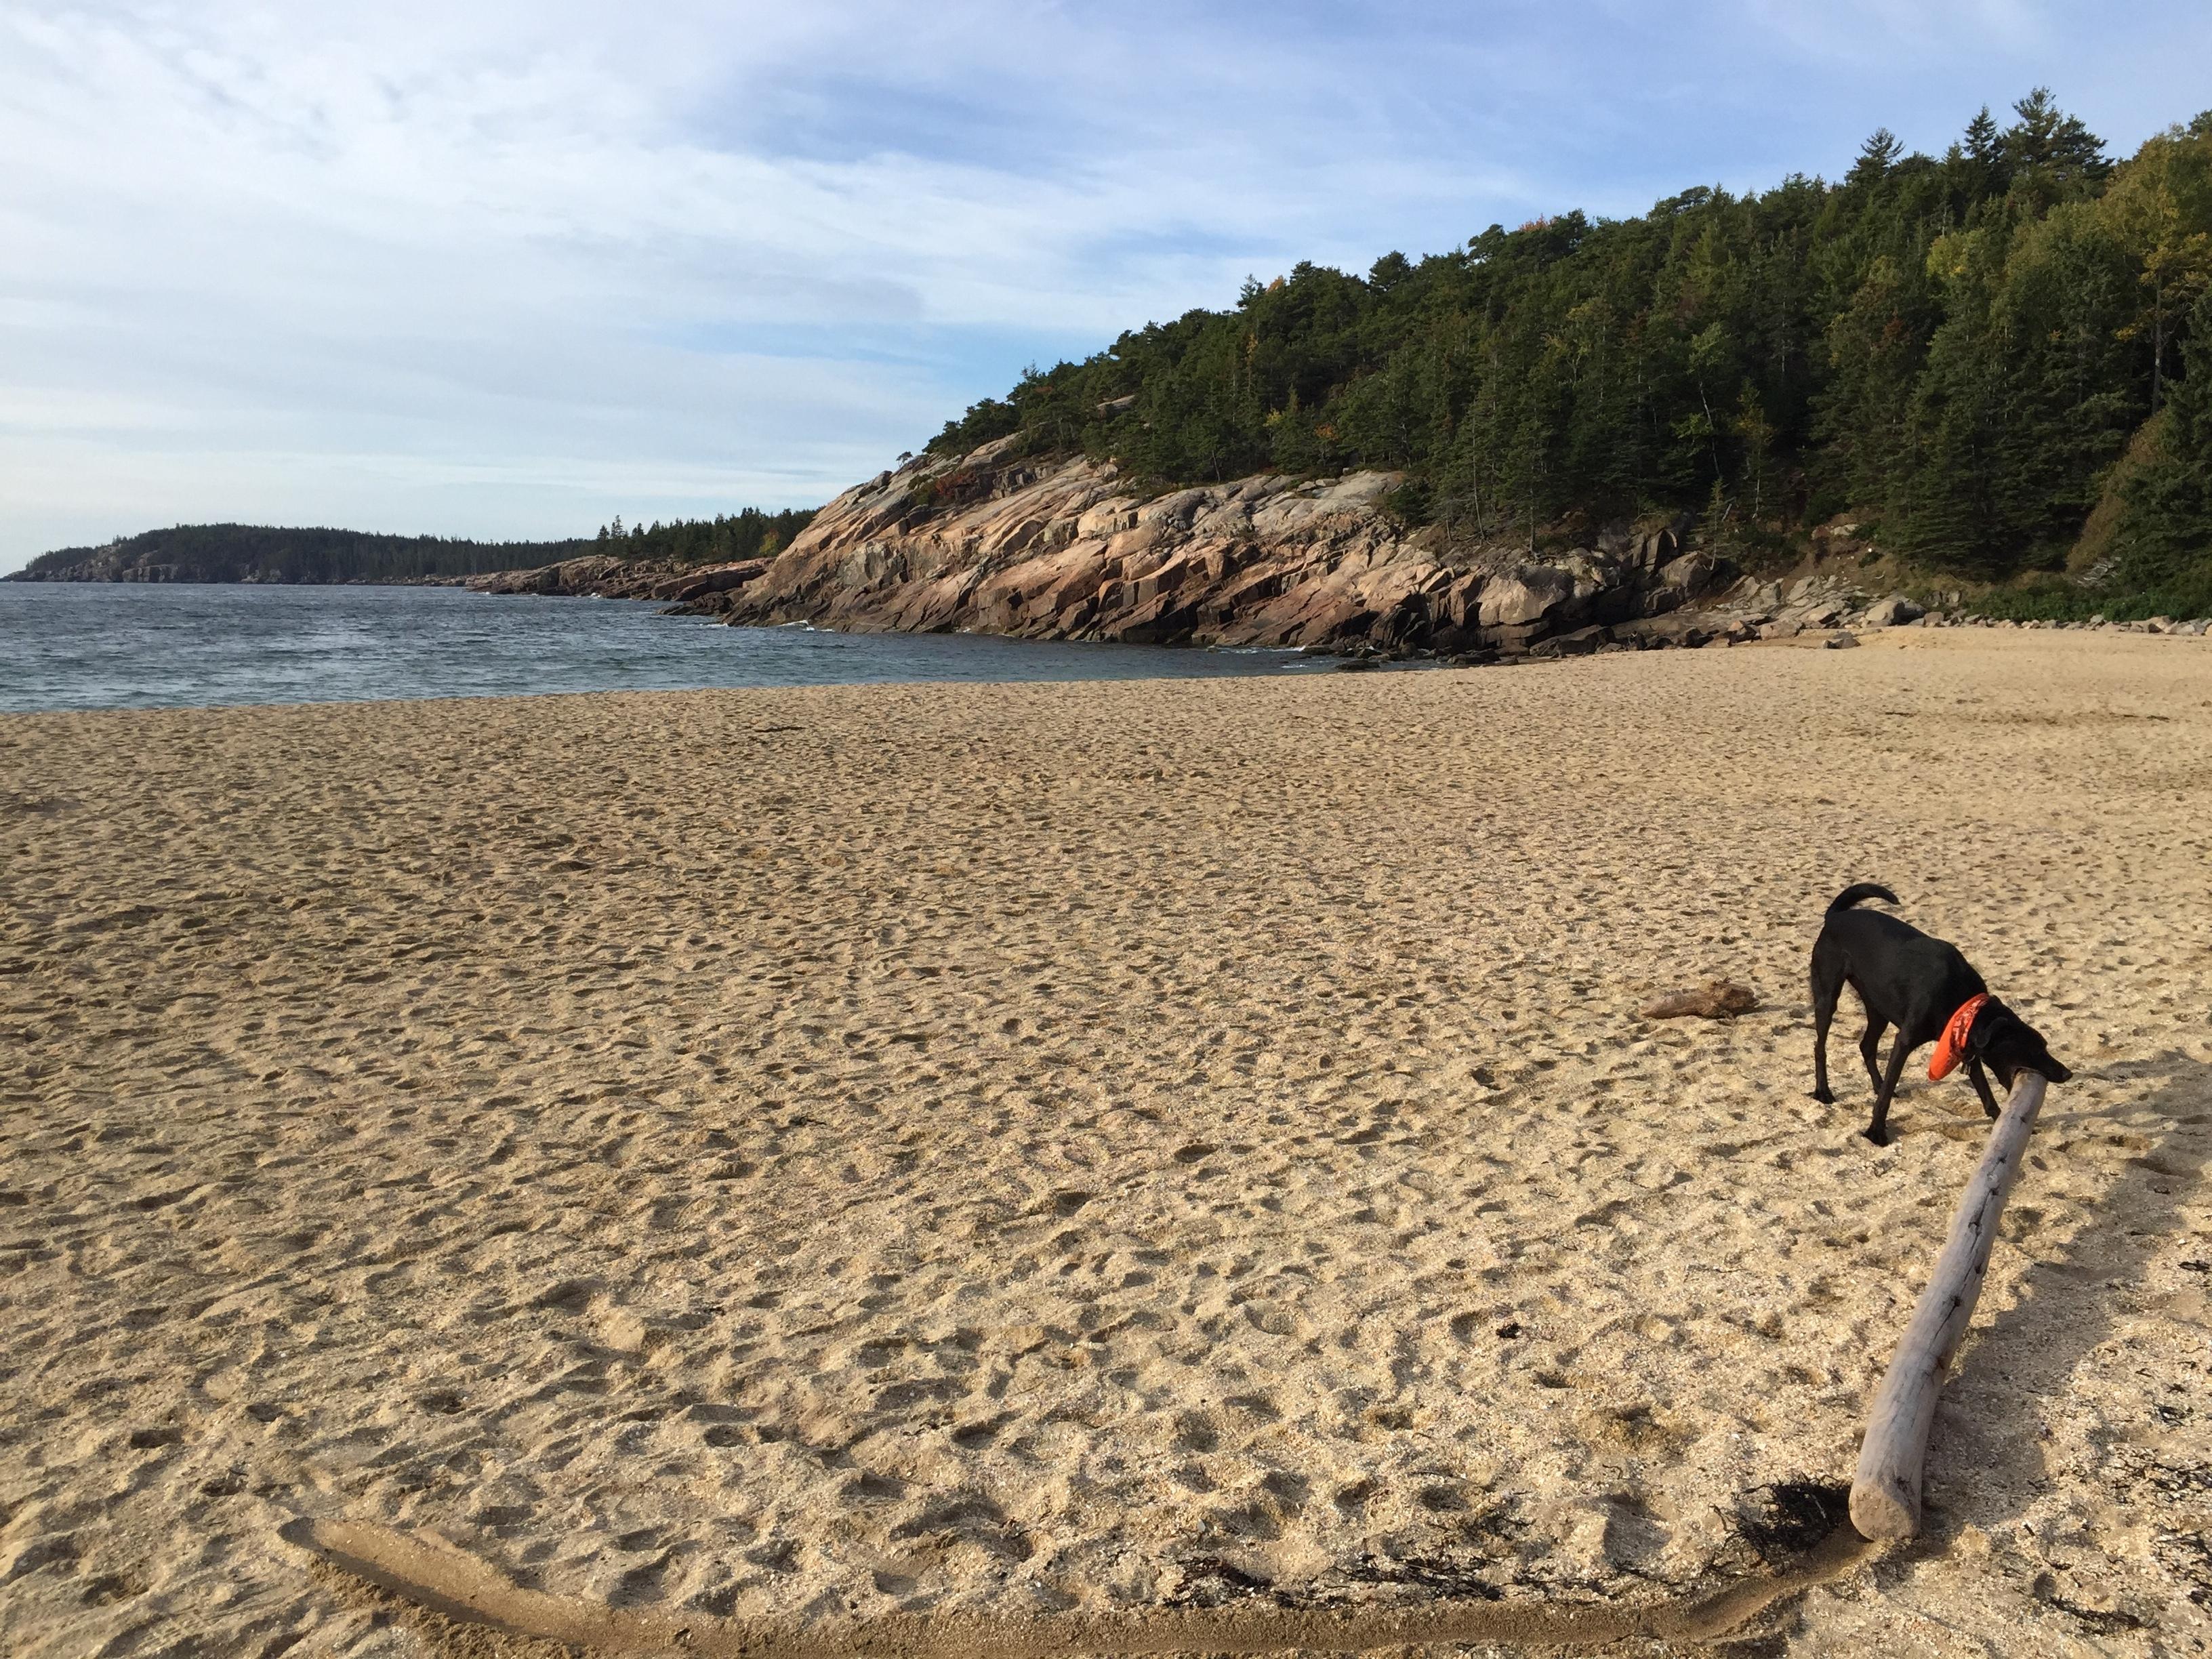 Tucker having fun on the dog friendly Sand Beach (dog friendly when it's not summer).